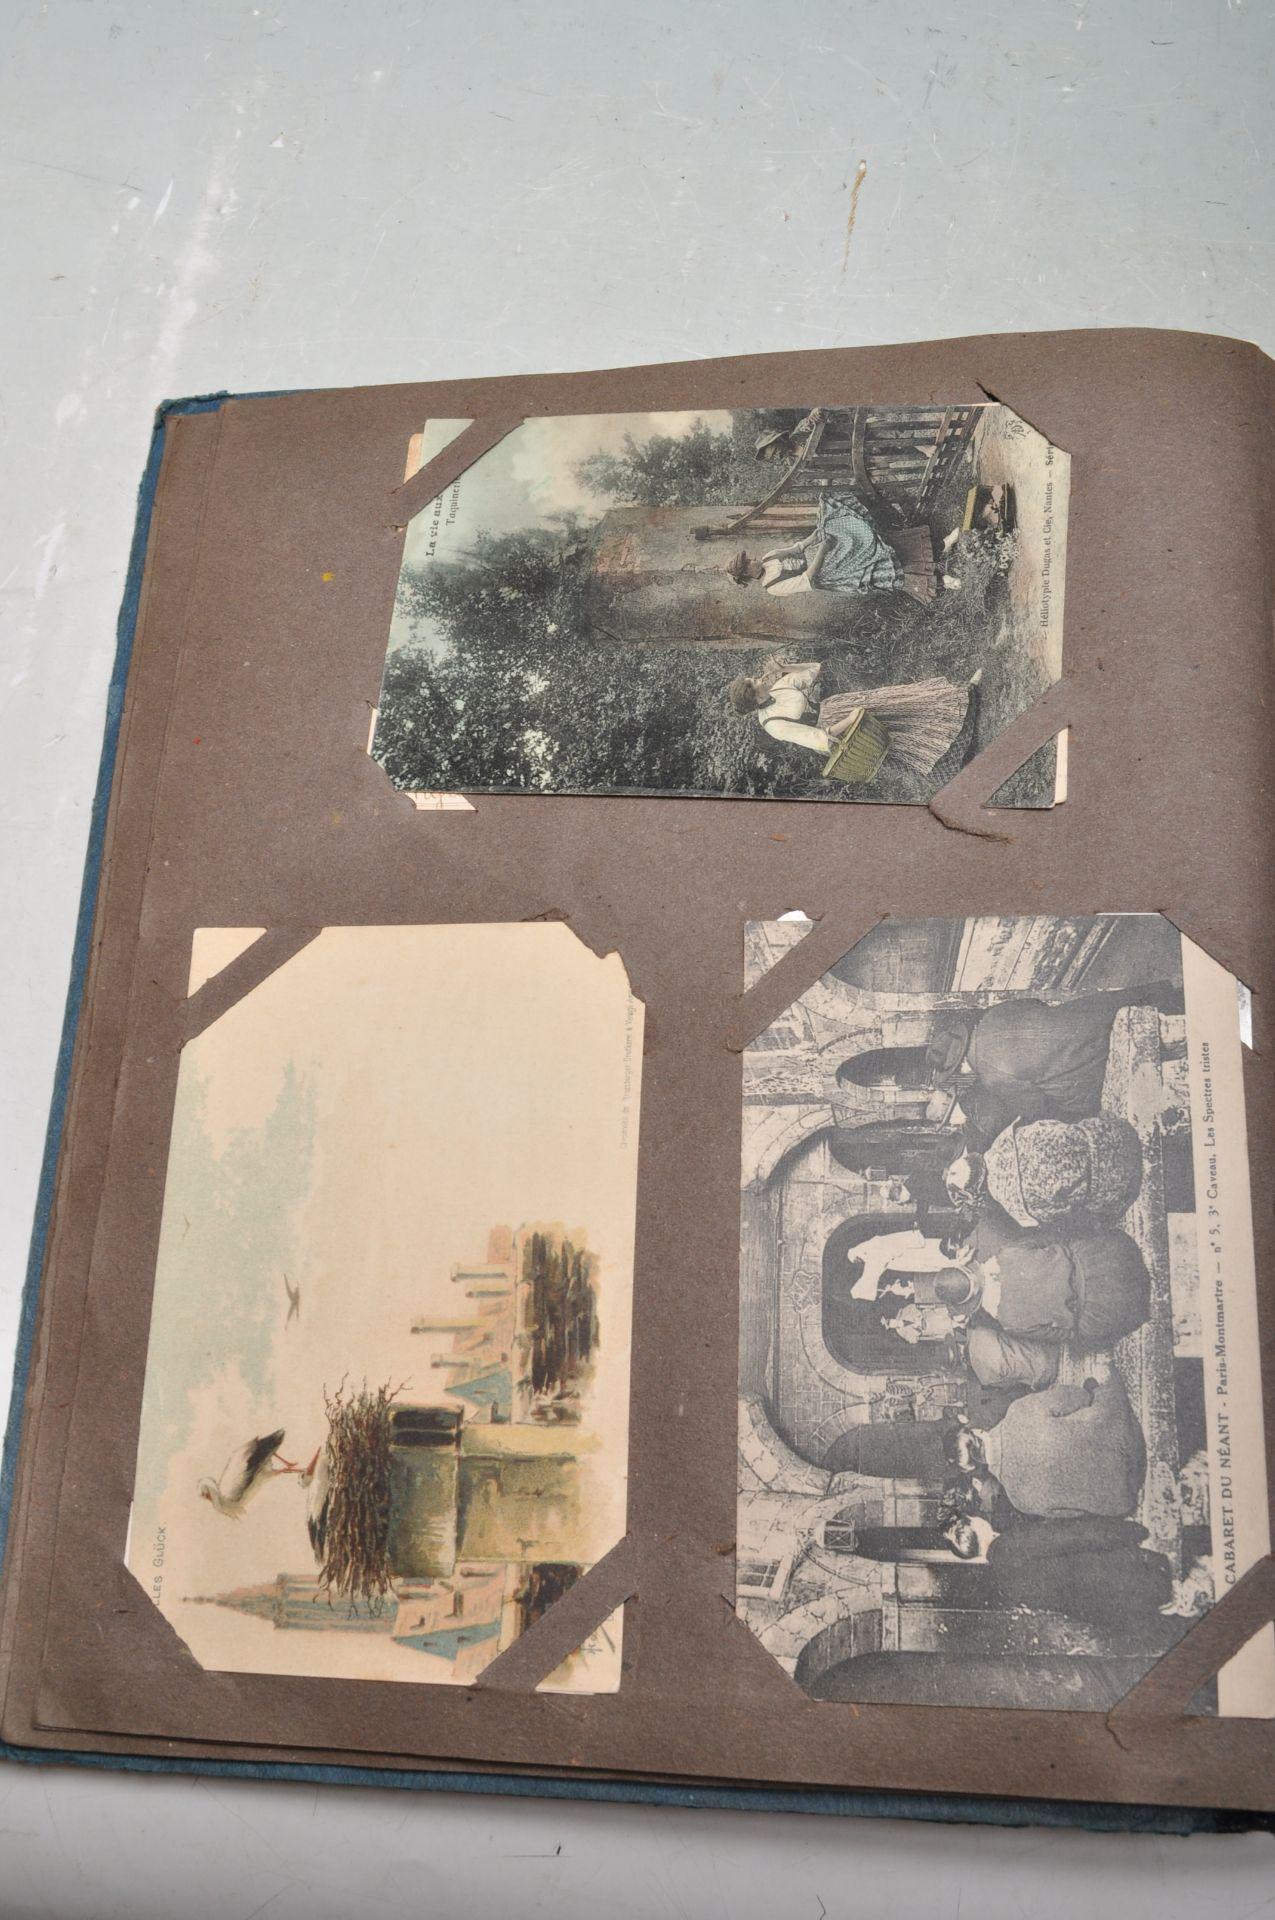 ALBUM OF FOREIGN POSTCARDS - ALL CIRCA WW1 PERIOD - Bild 10 aus 23